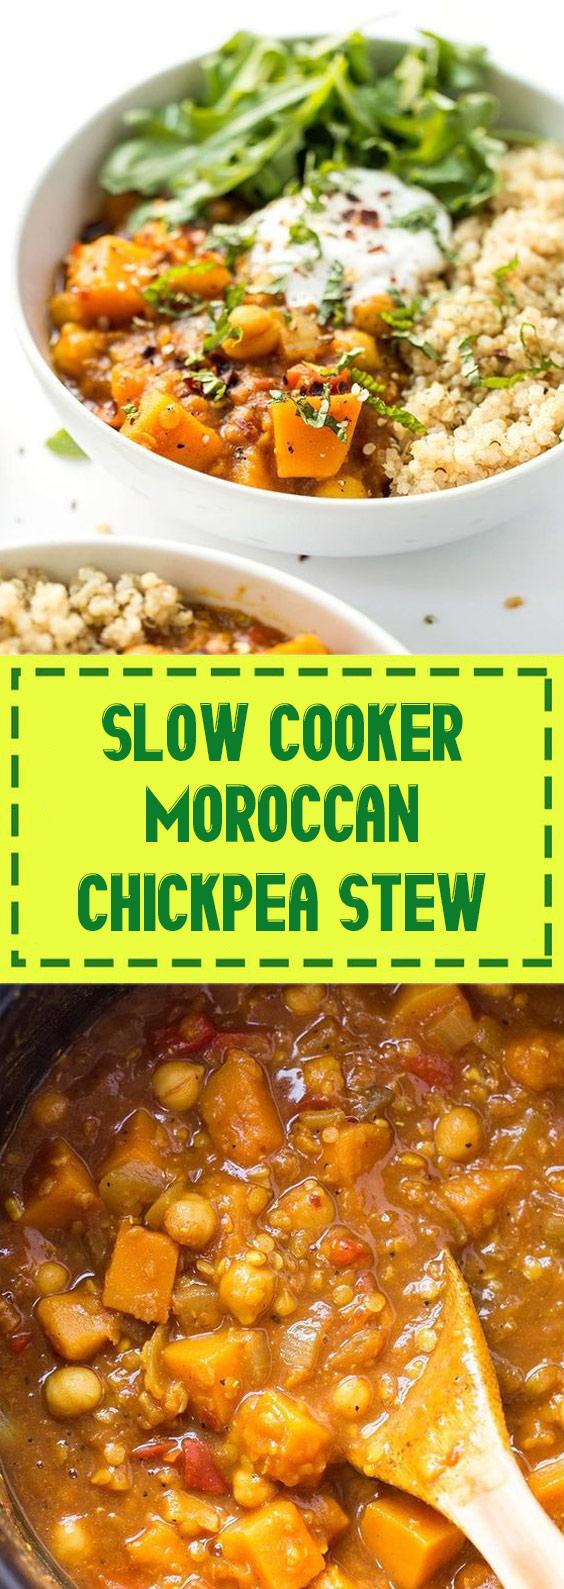 Slow Cooker Vegetarian Chili Mac